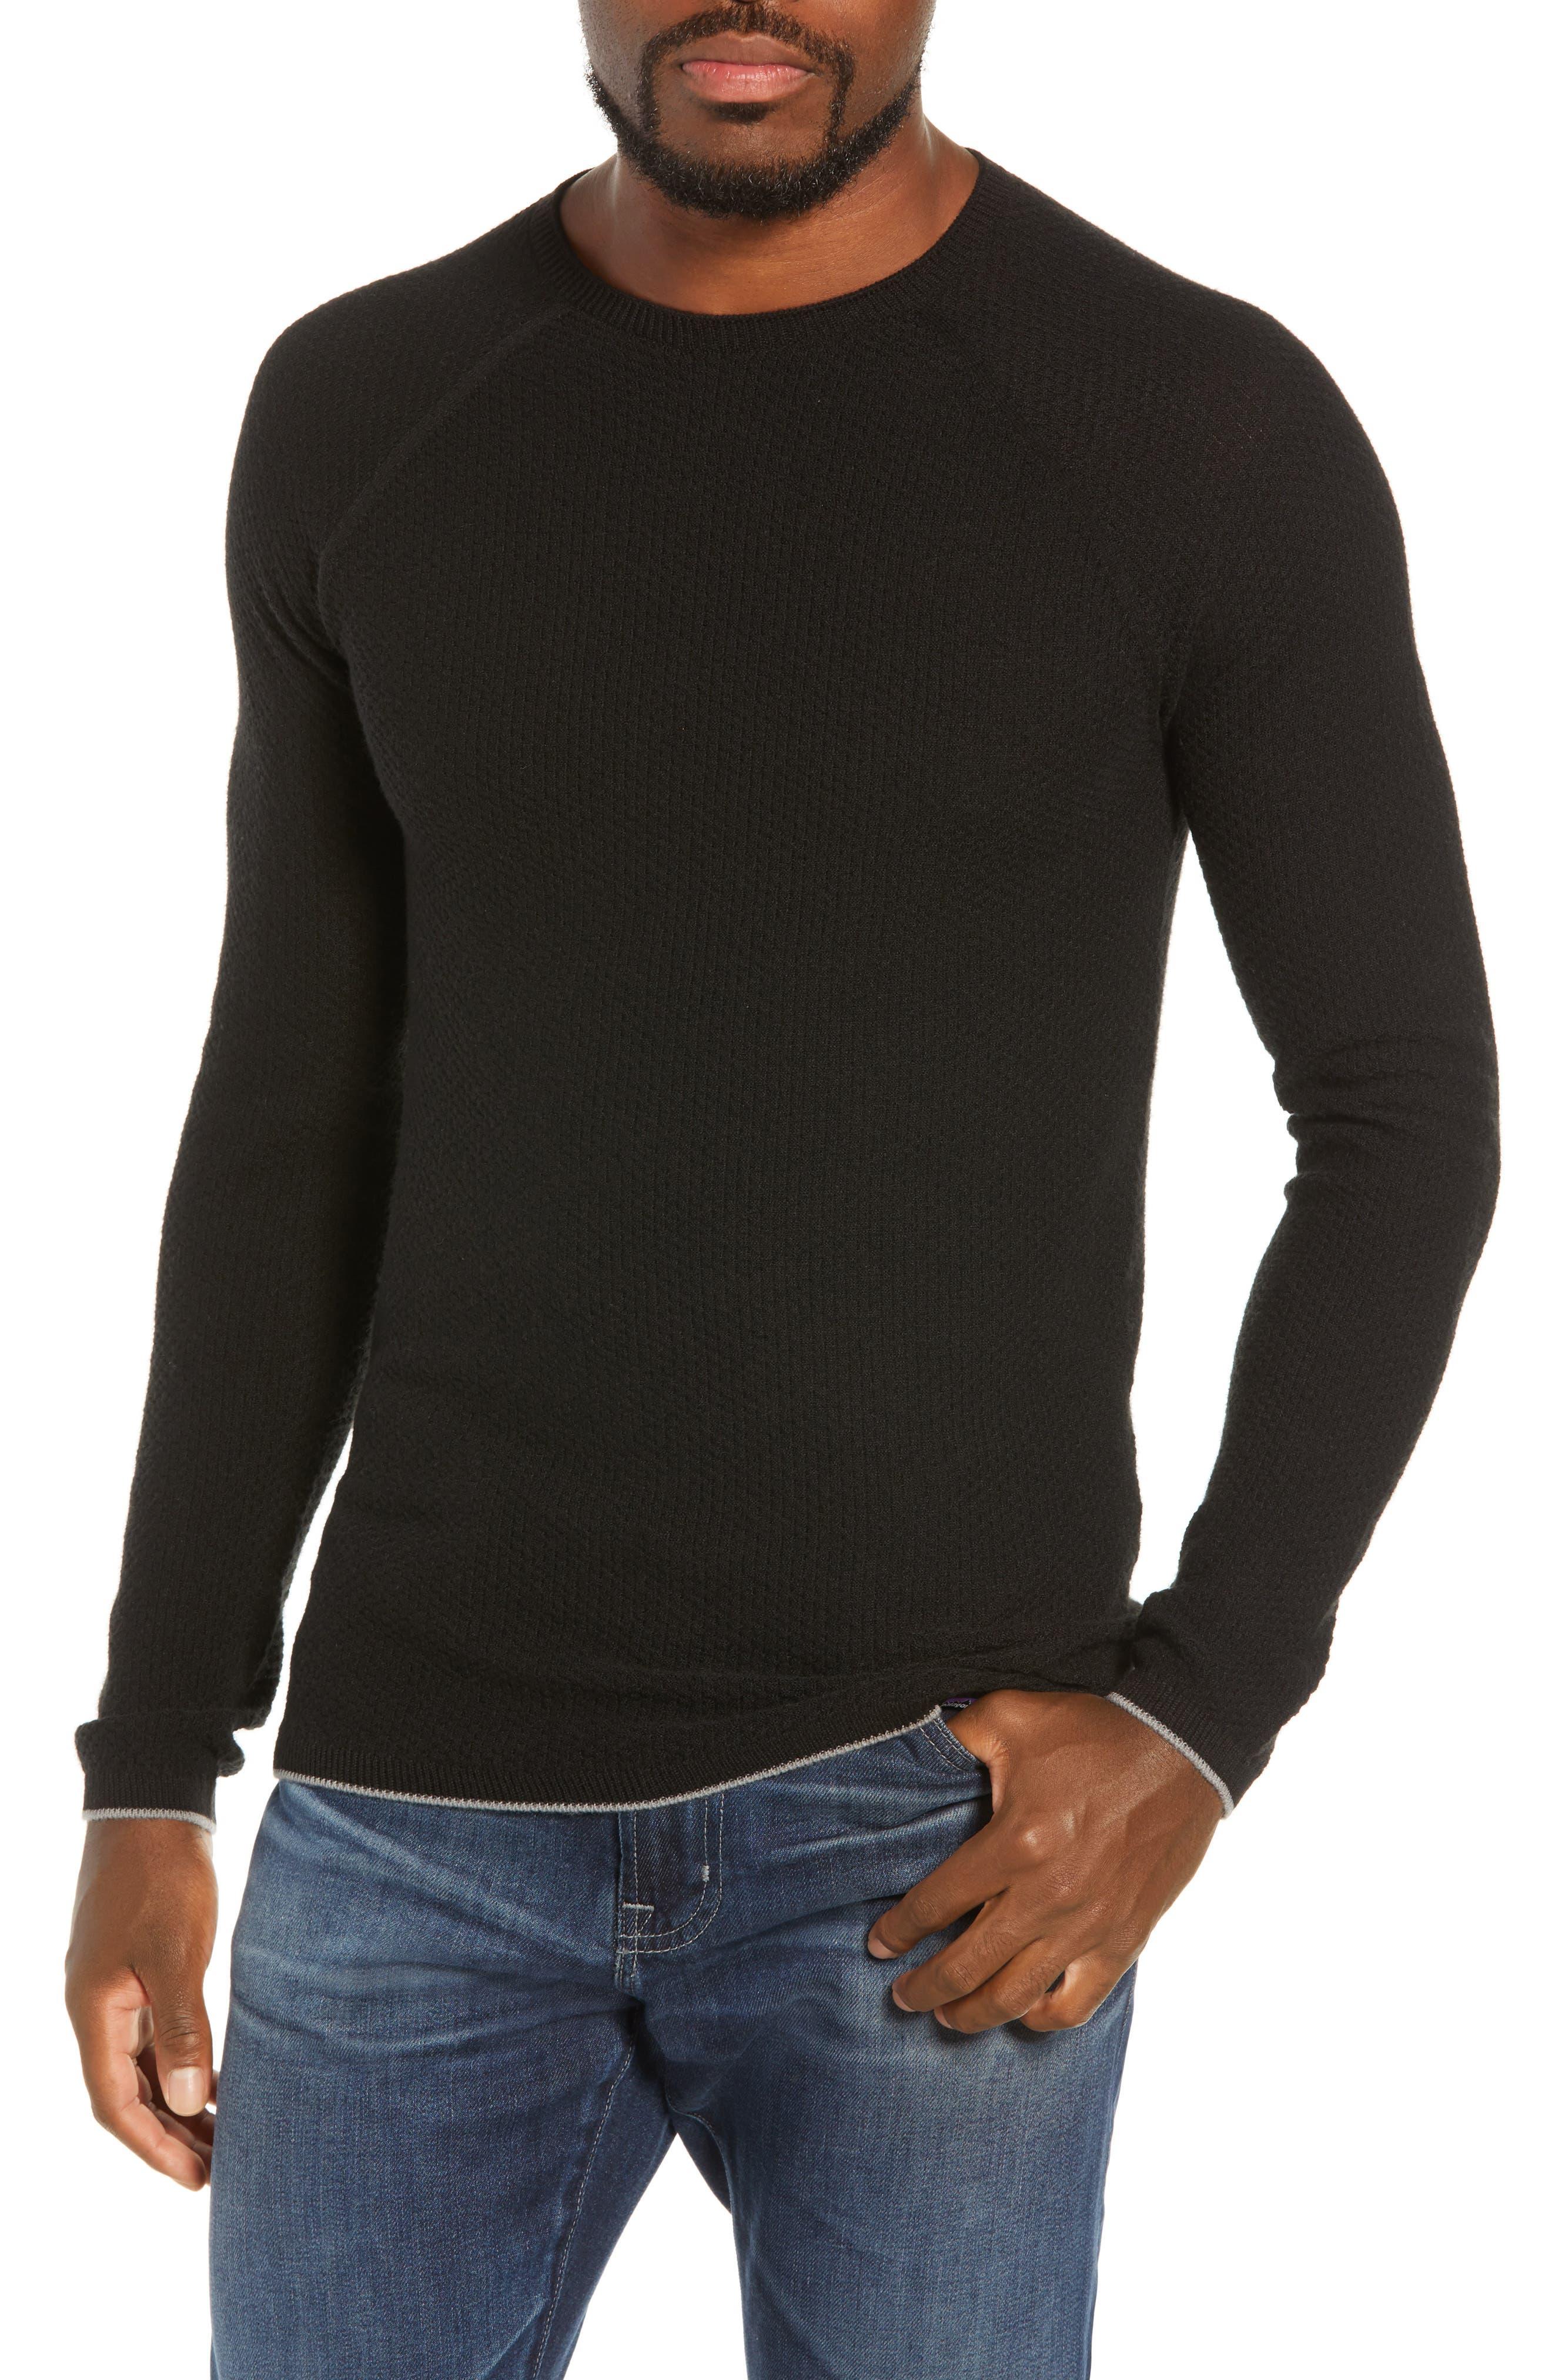 Capilene<sup>®</sup> Lightweight Air Crew Sweater,                         Main,                         color, BLACK